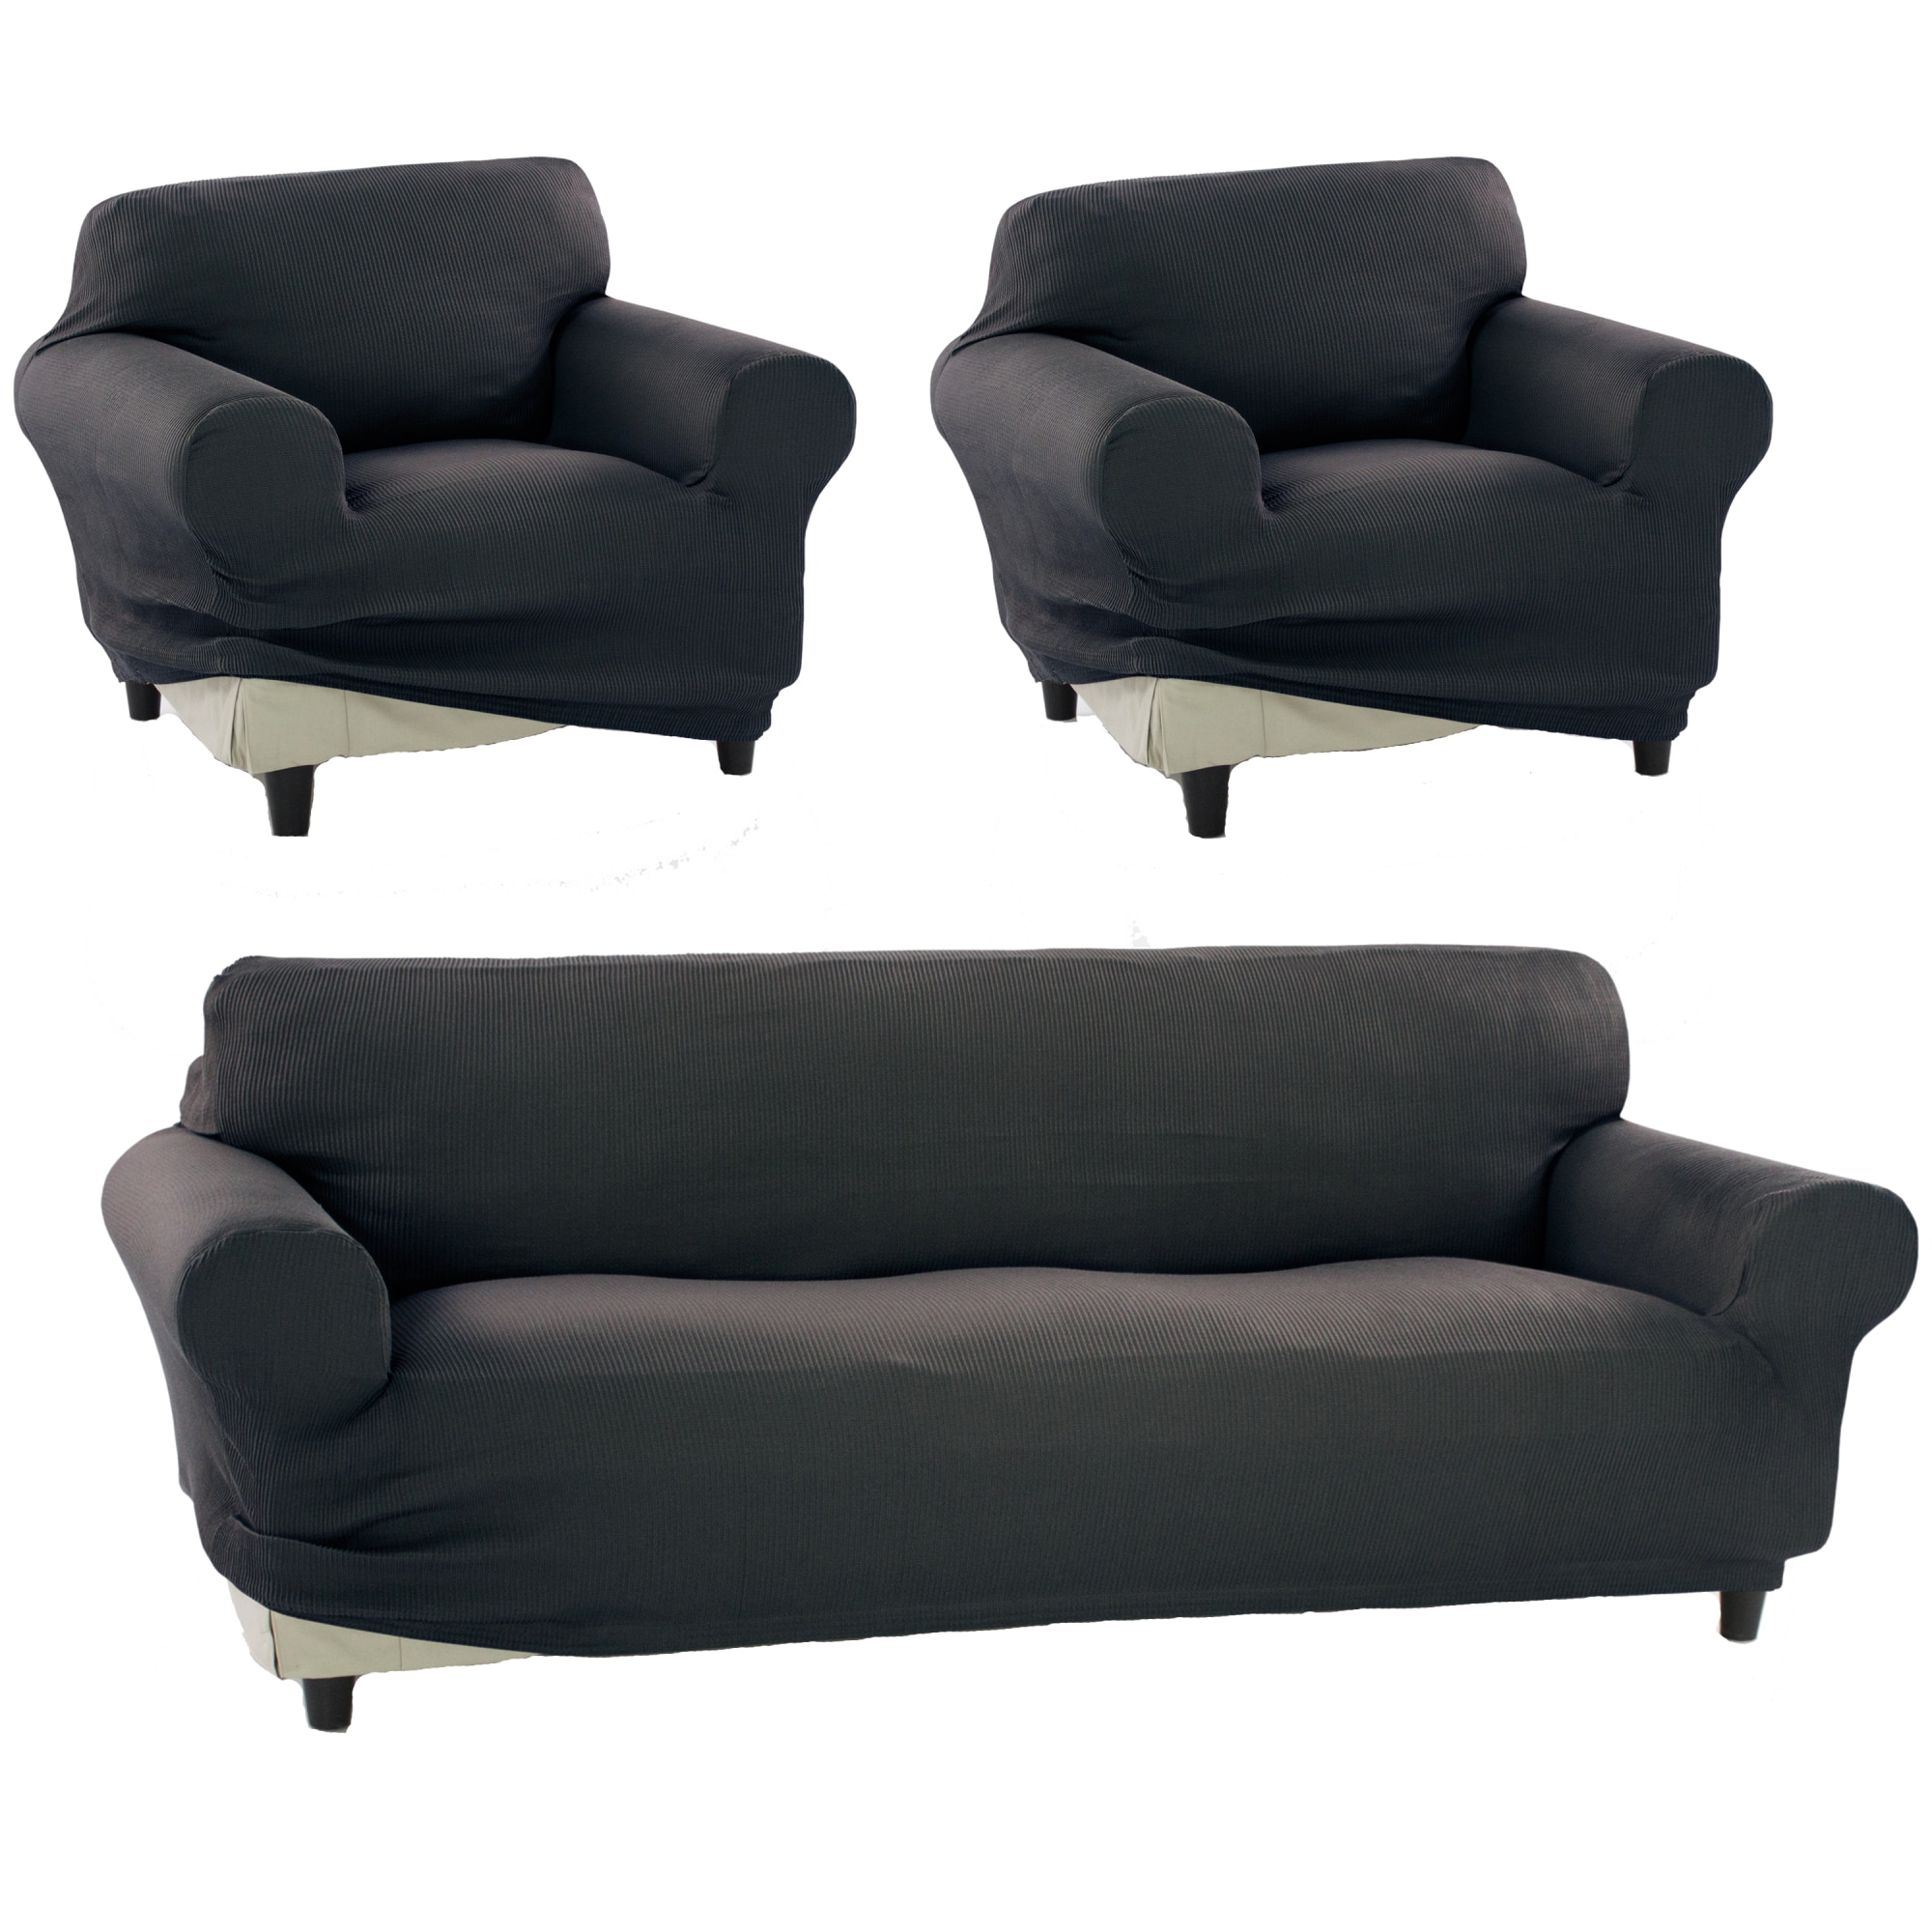 Fotografie Set huse elastice pentru canapea 3 locuri si 2 fotolii Kring Nairobi, 60% bumbac+ 35% poliester + 5% elastan, Gri